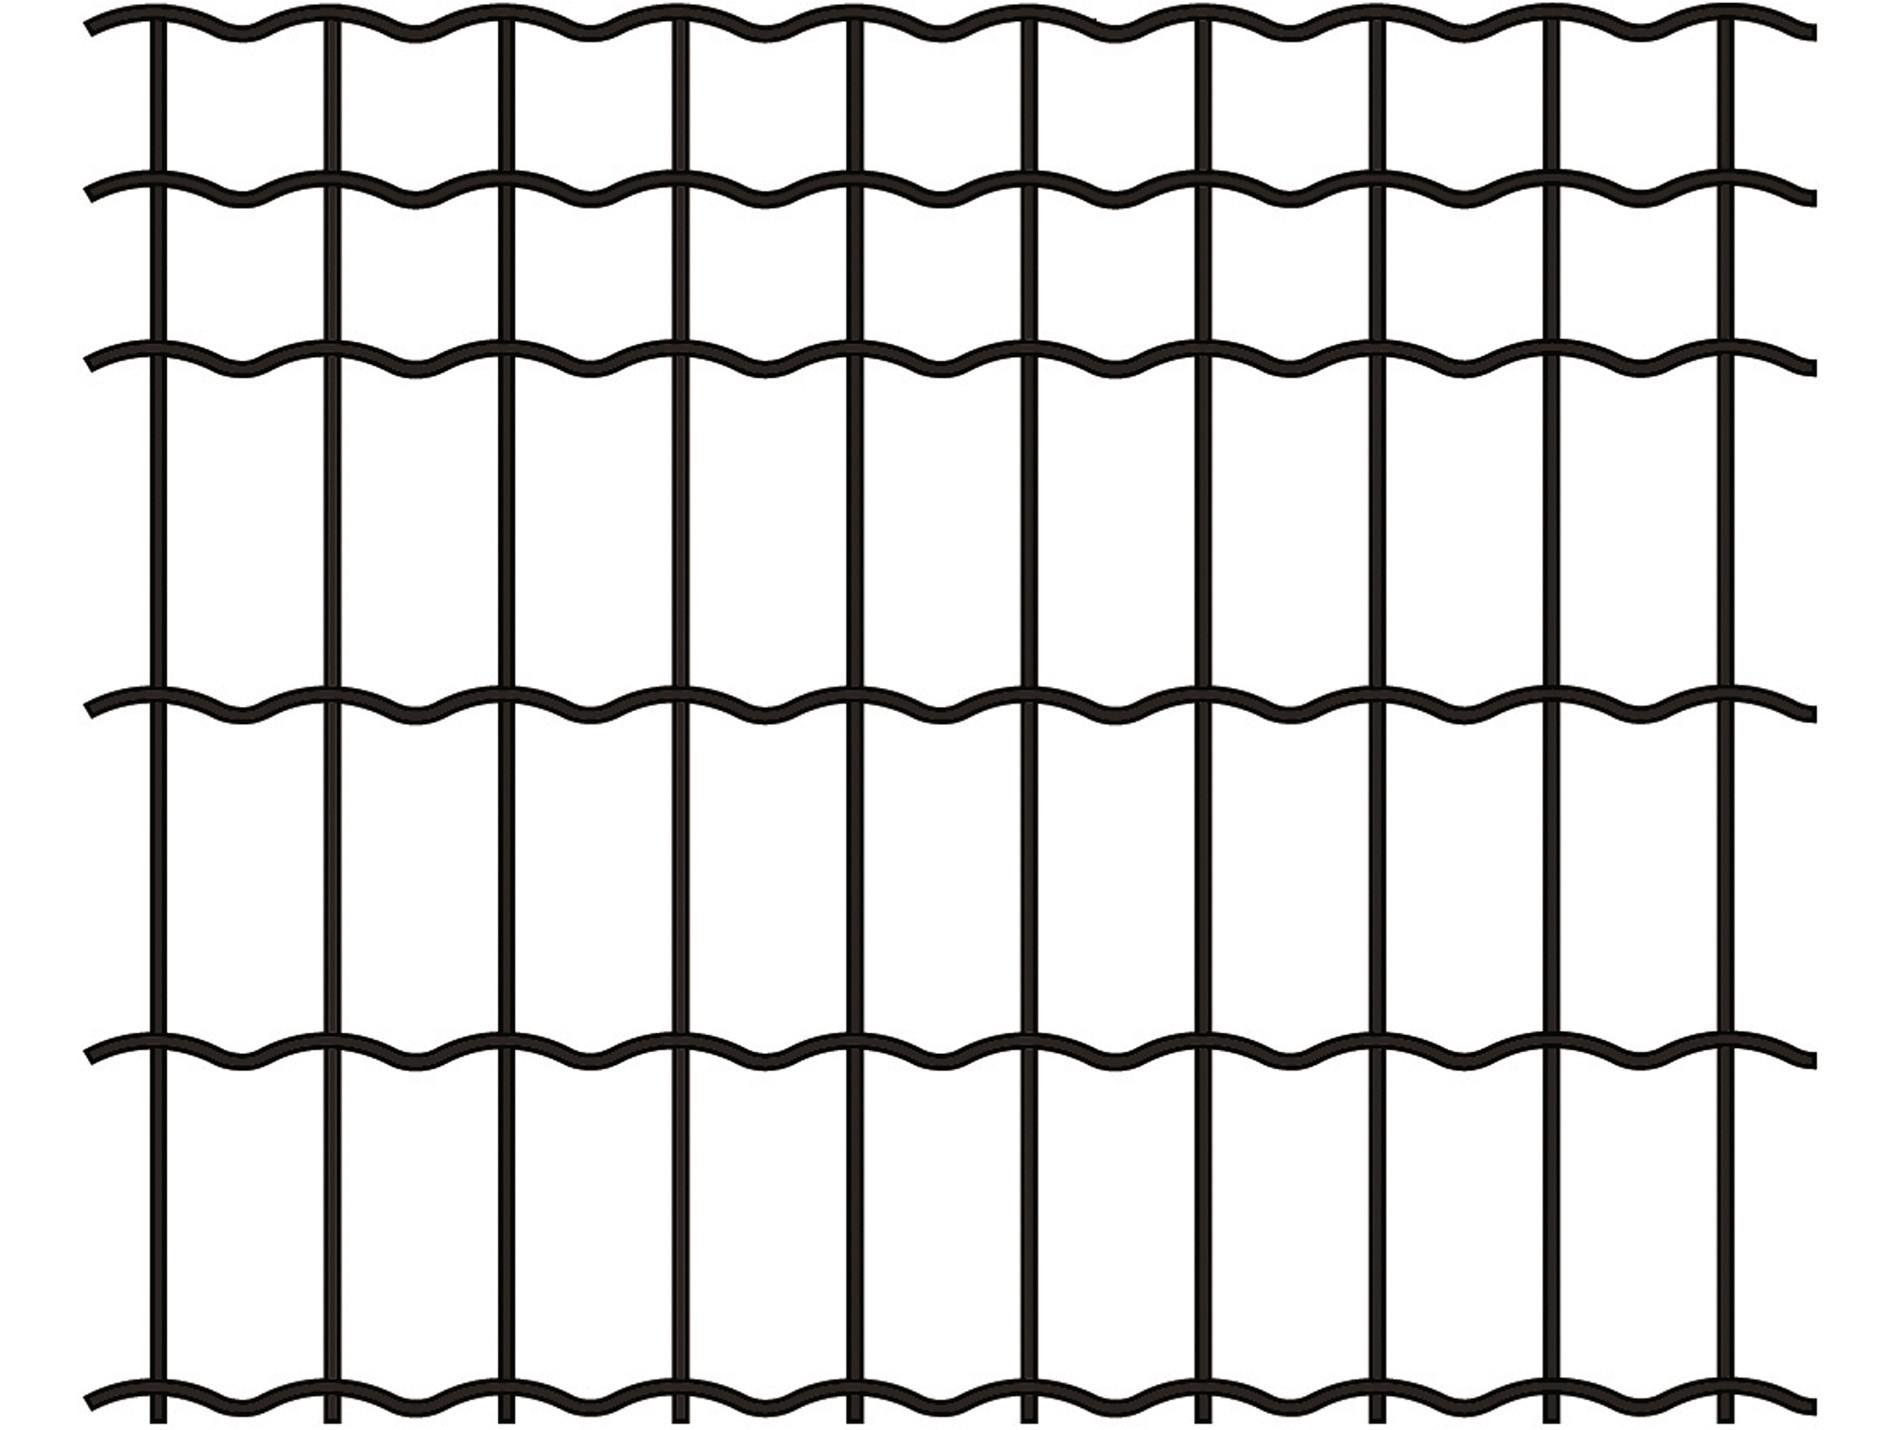 Grillage Jardi Brico gris 10x5 H1,20m L25m